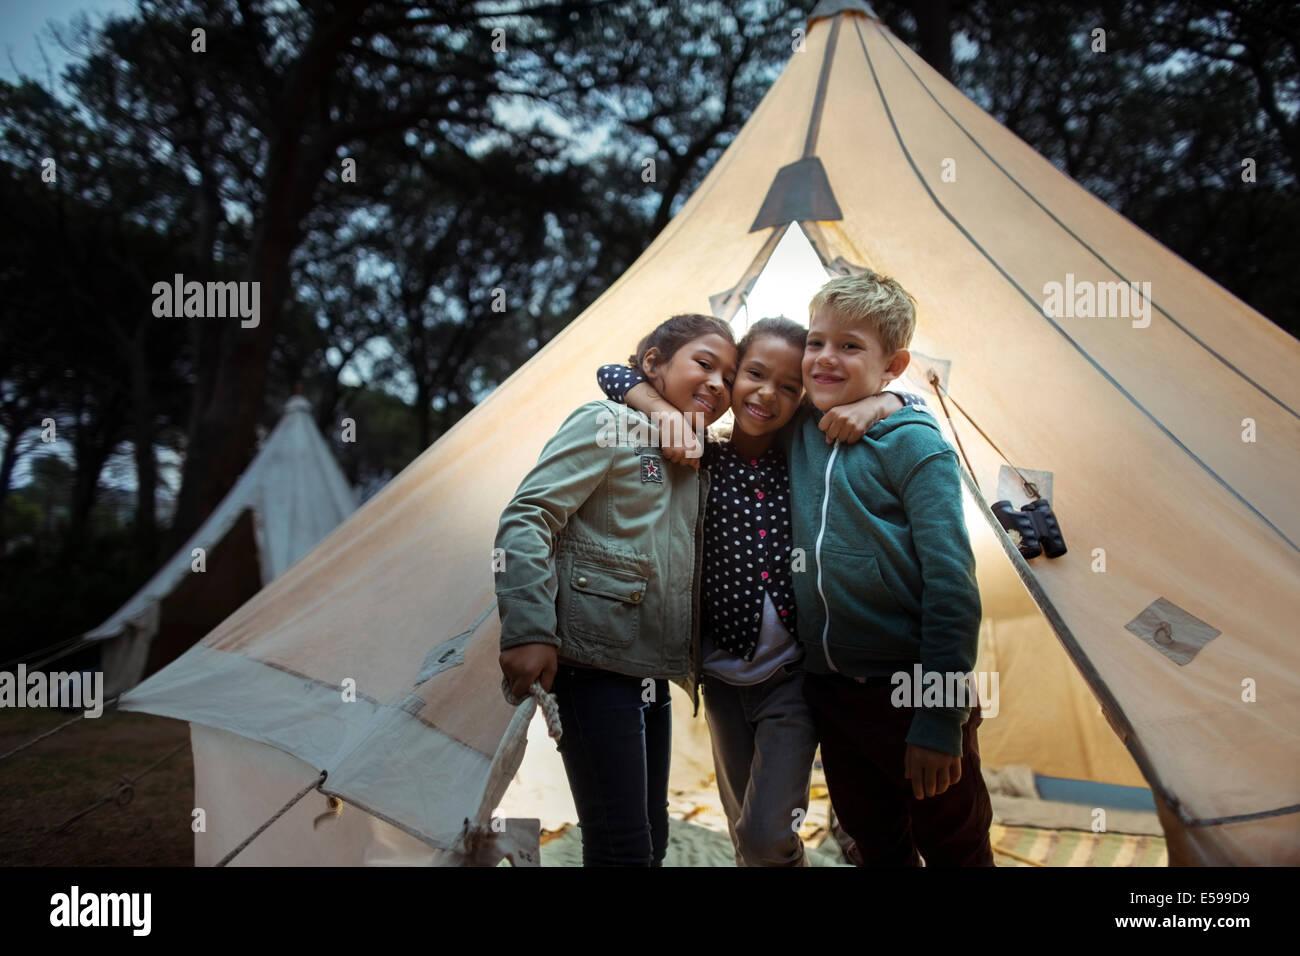 Kinder umarmen von Tipi auf Campingplatz Stockbild